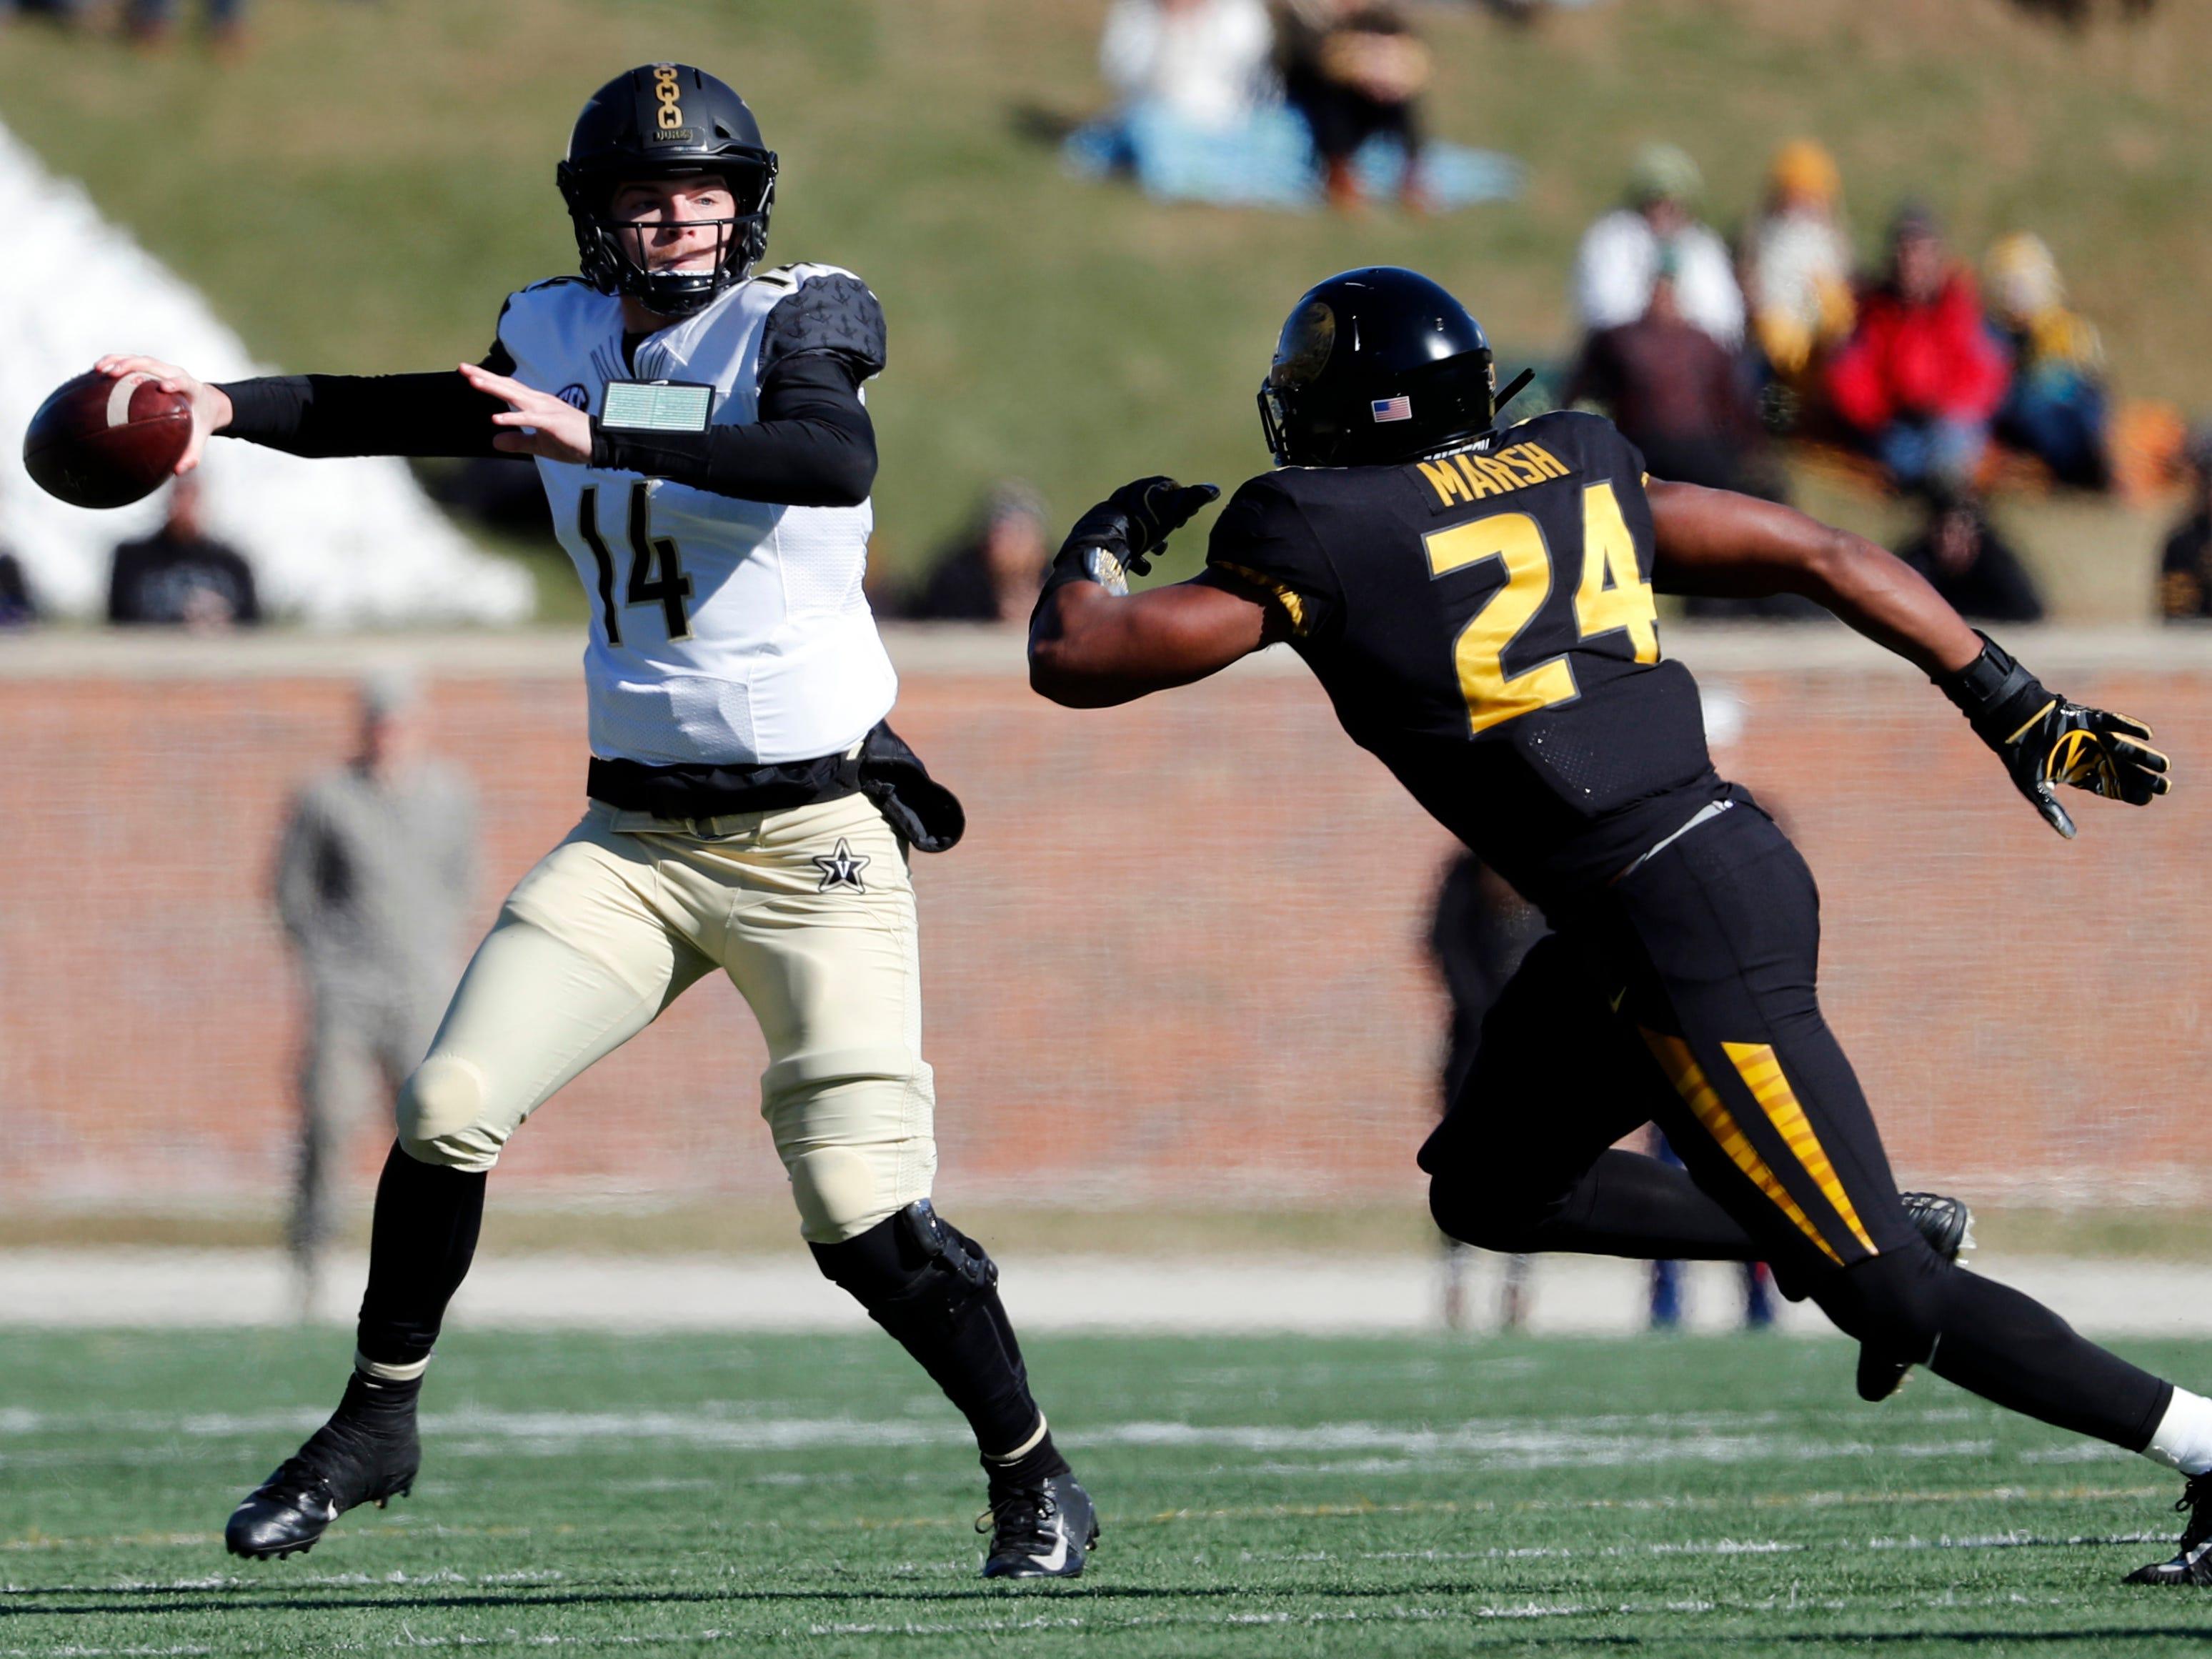 Vanderbilt quarterback Kyle Shurmur, left, throws under pressure from Missouri linebacker Terez Hall during the first half of an NCAA college football game Saturday, Nov. 10, 2018, in Columbia, Mo.